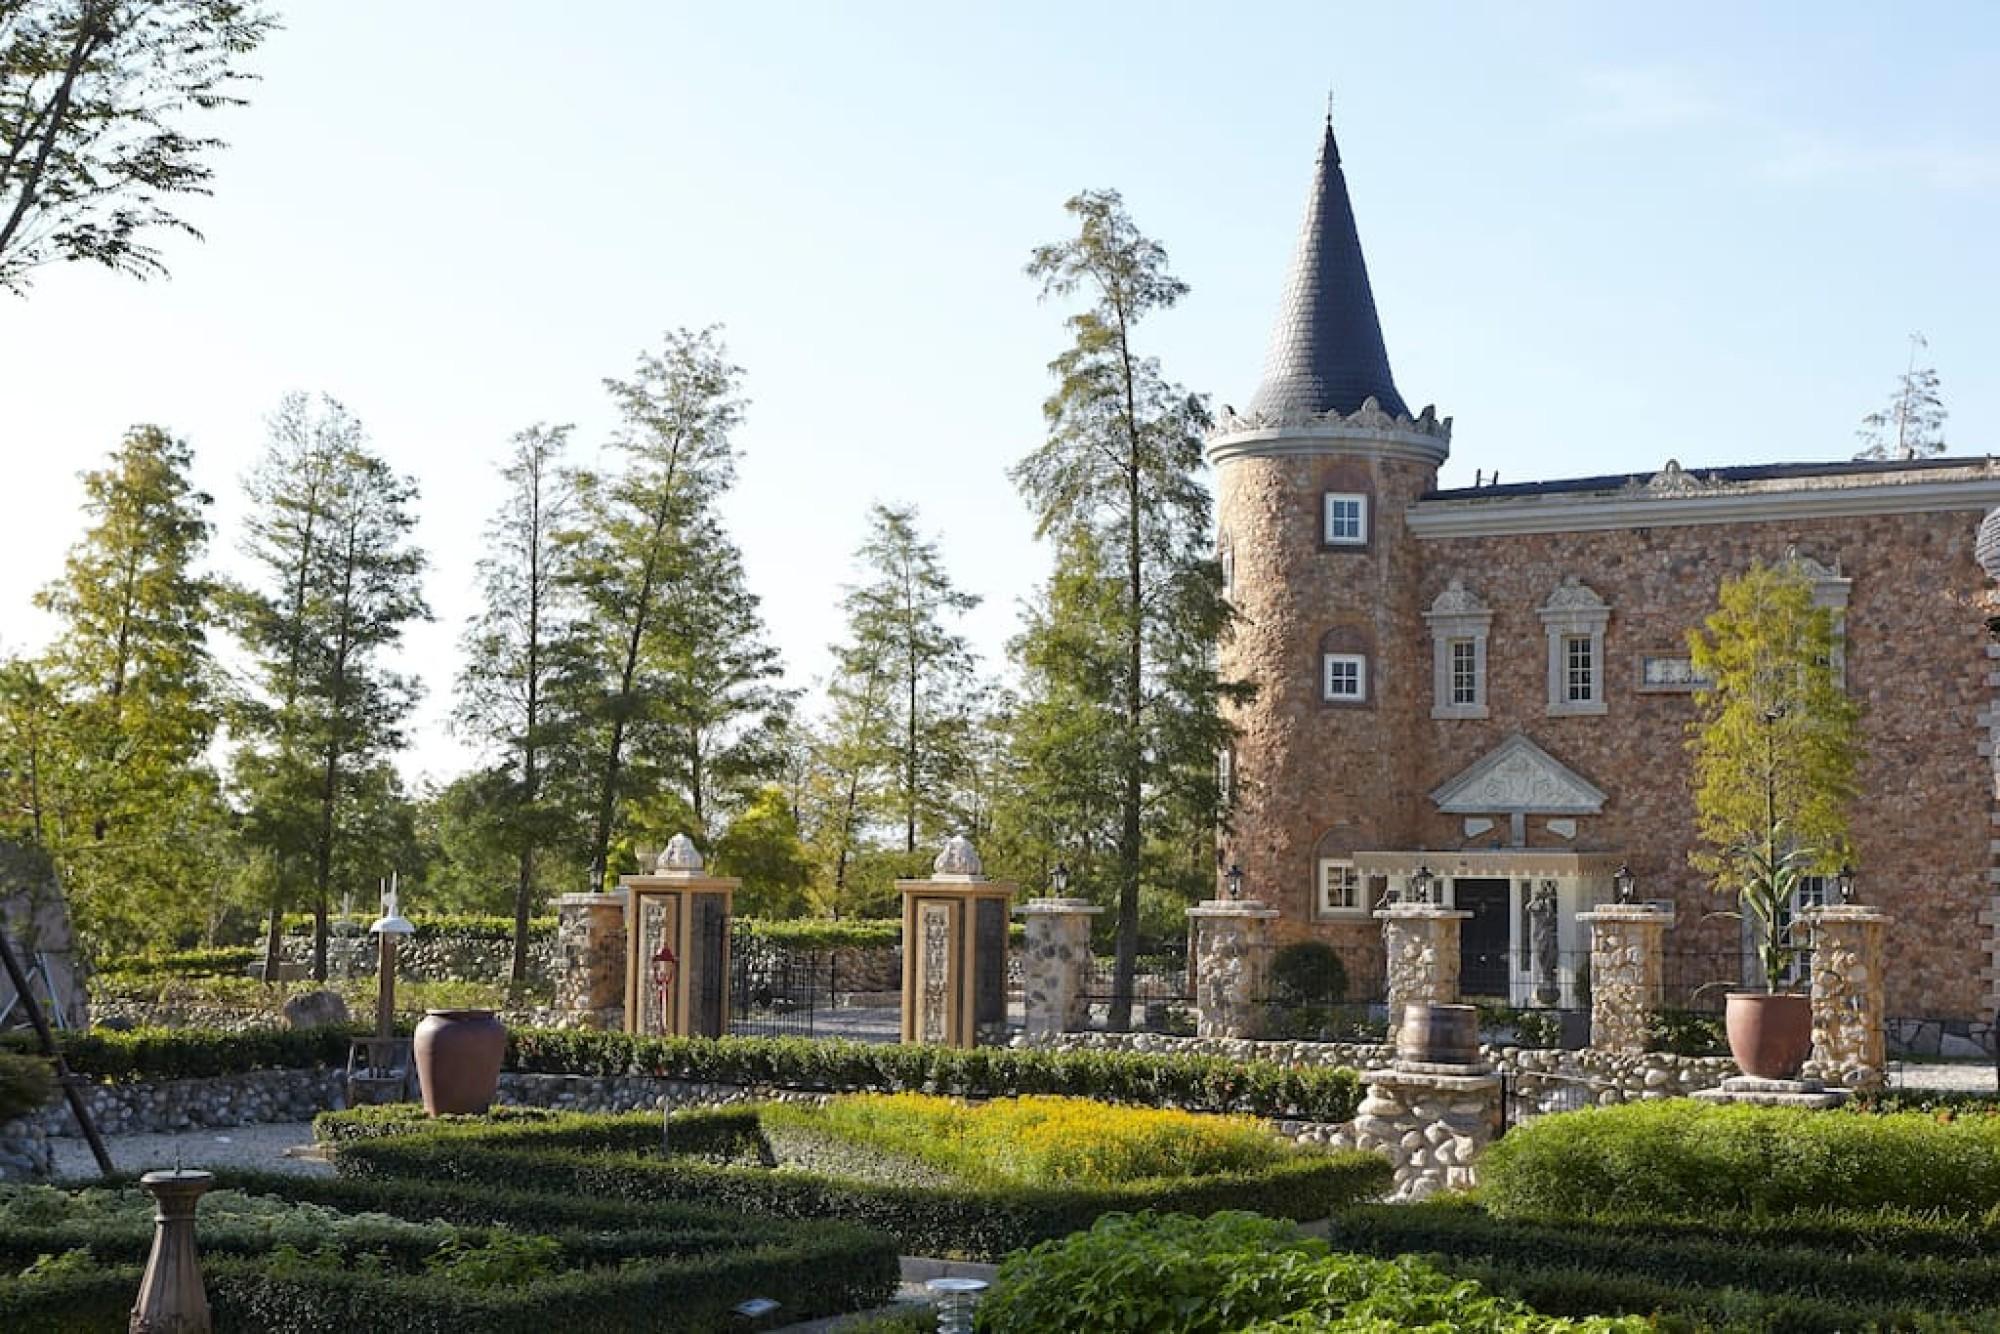 no.6『艾莉莎』花莲凤林 雪云城堡 19世纪欧式城堡